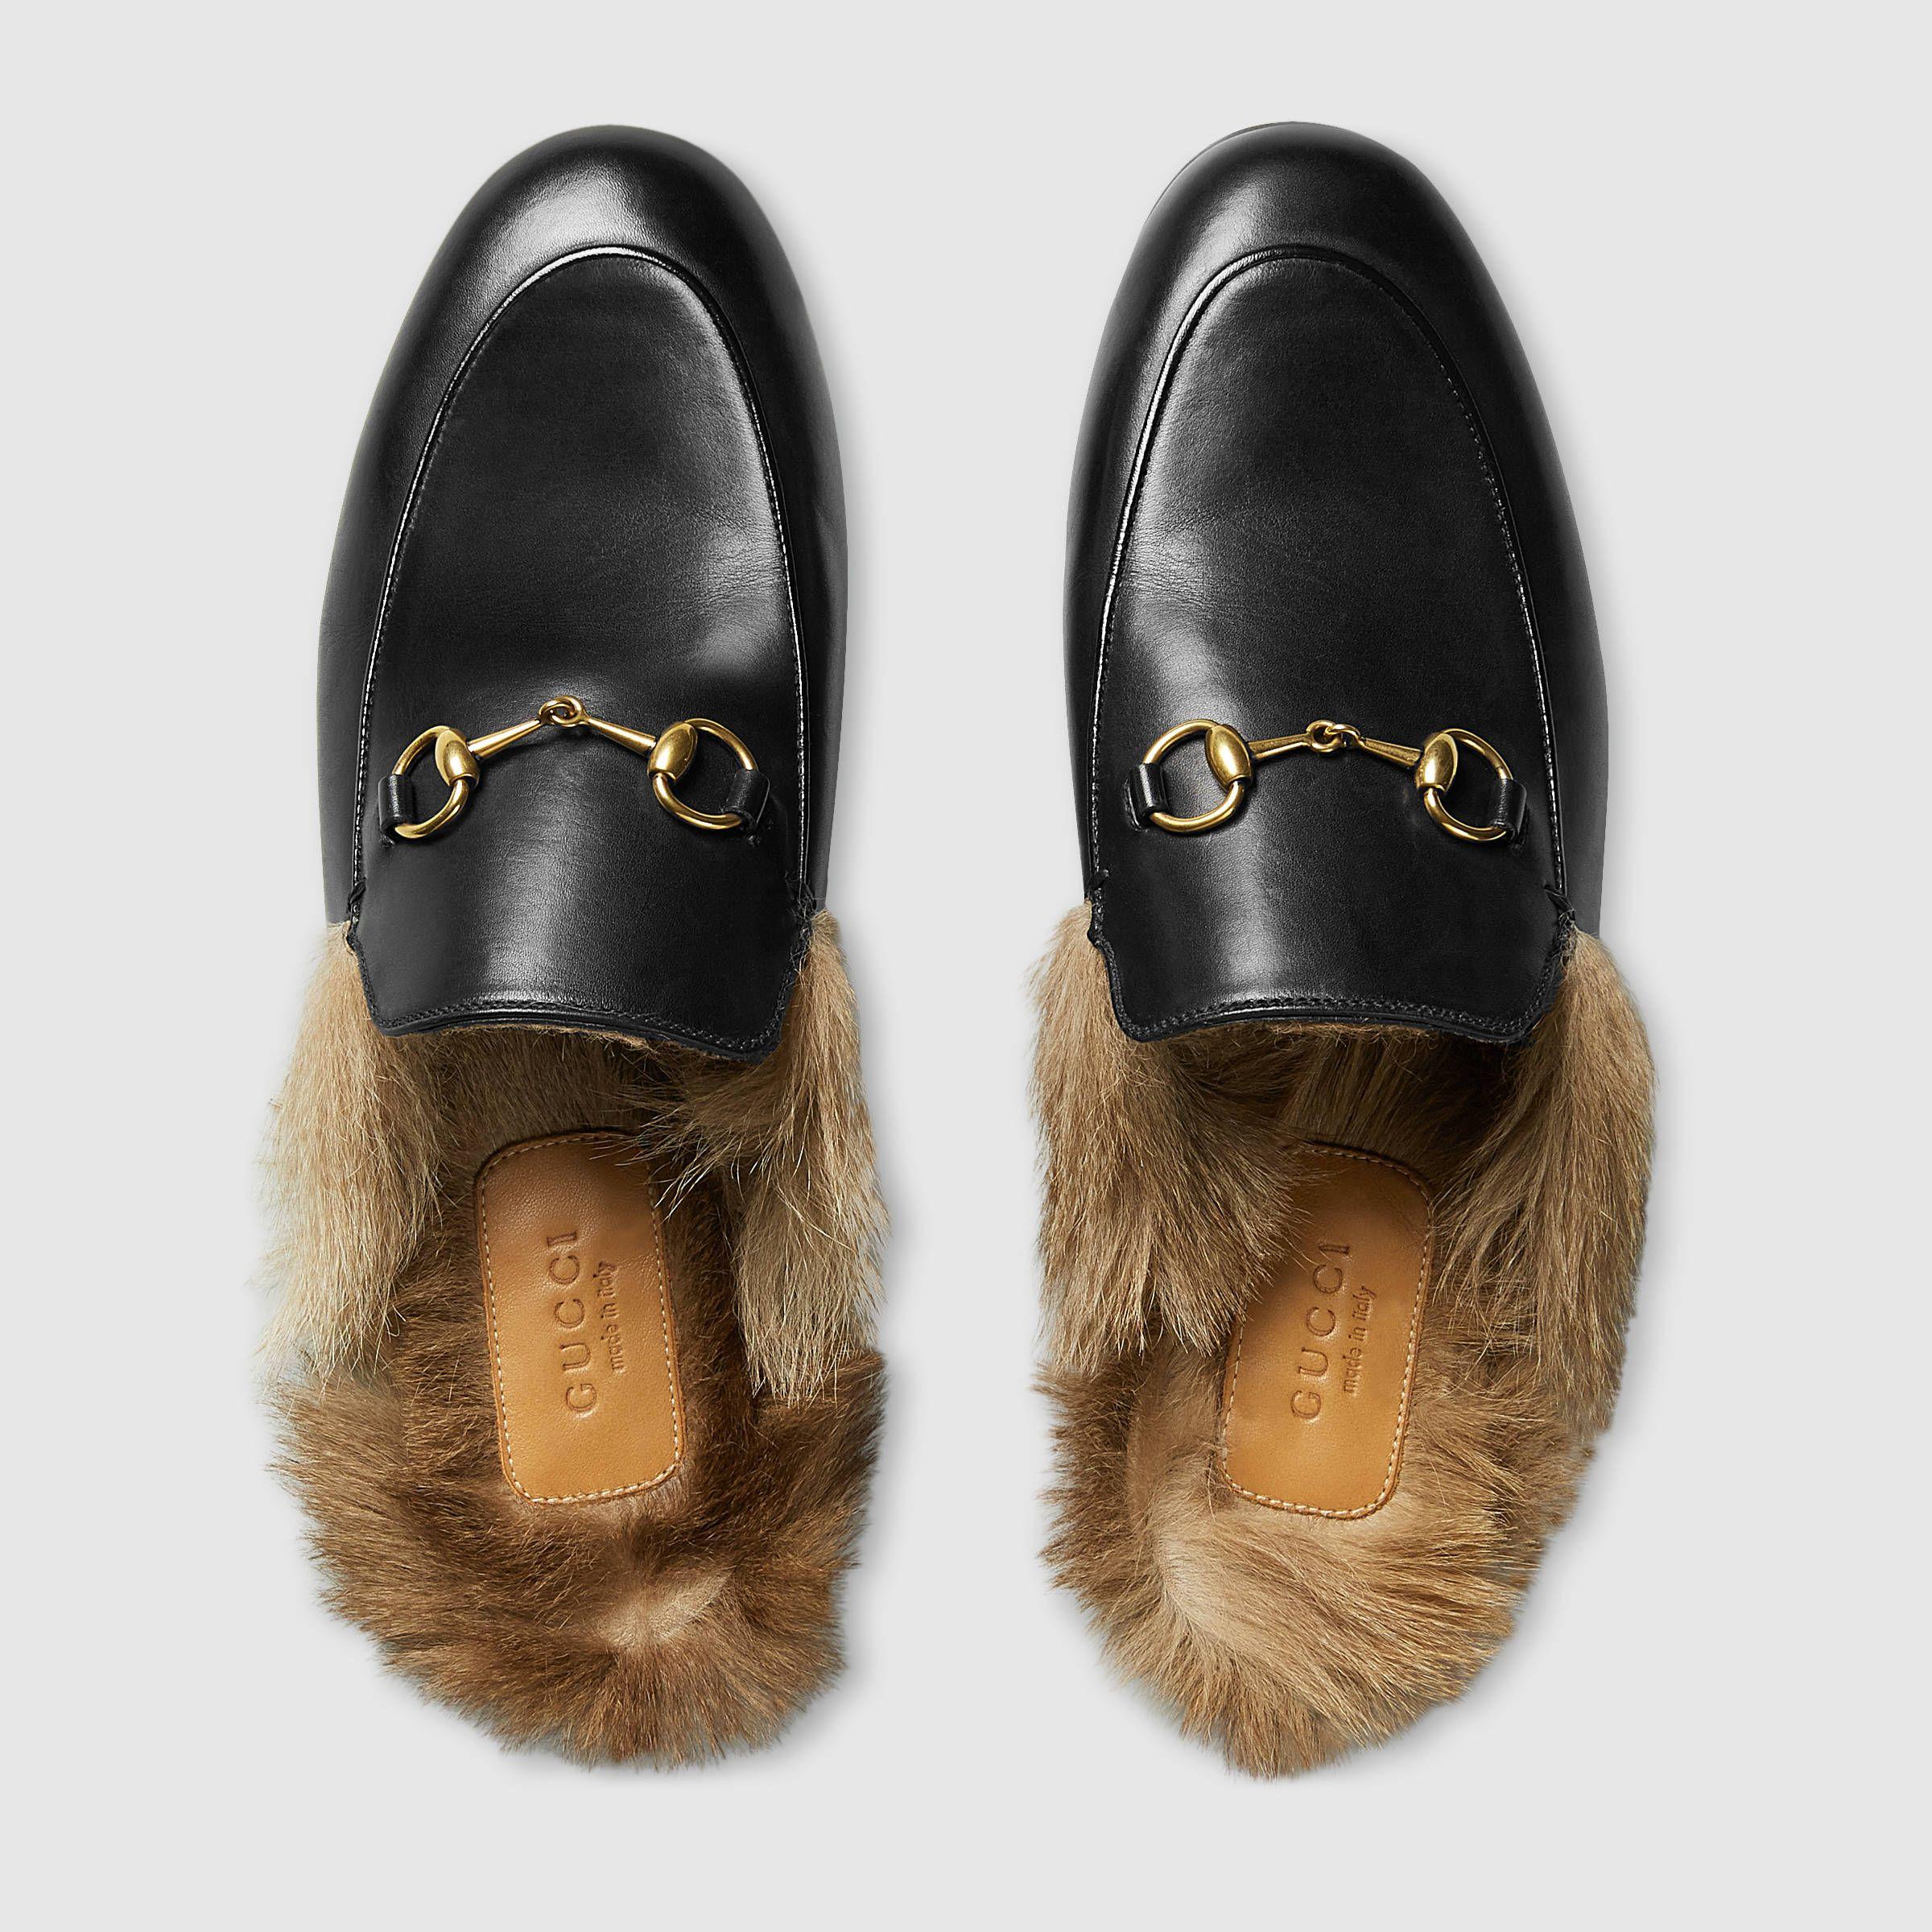 Gucci Women Princetown Leather Slipper 397749dkh201063